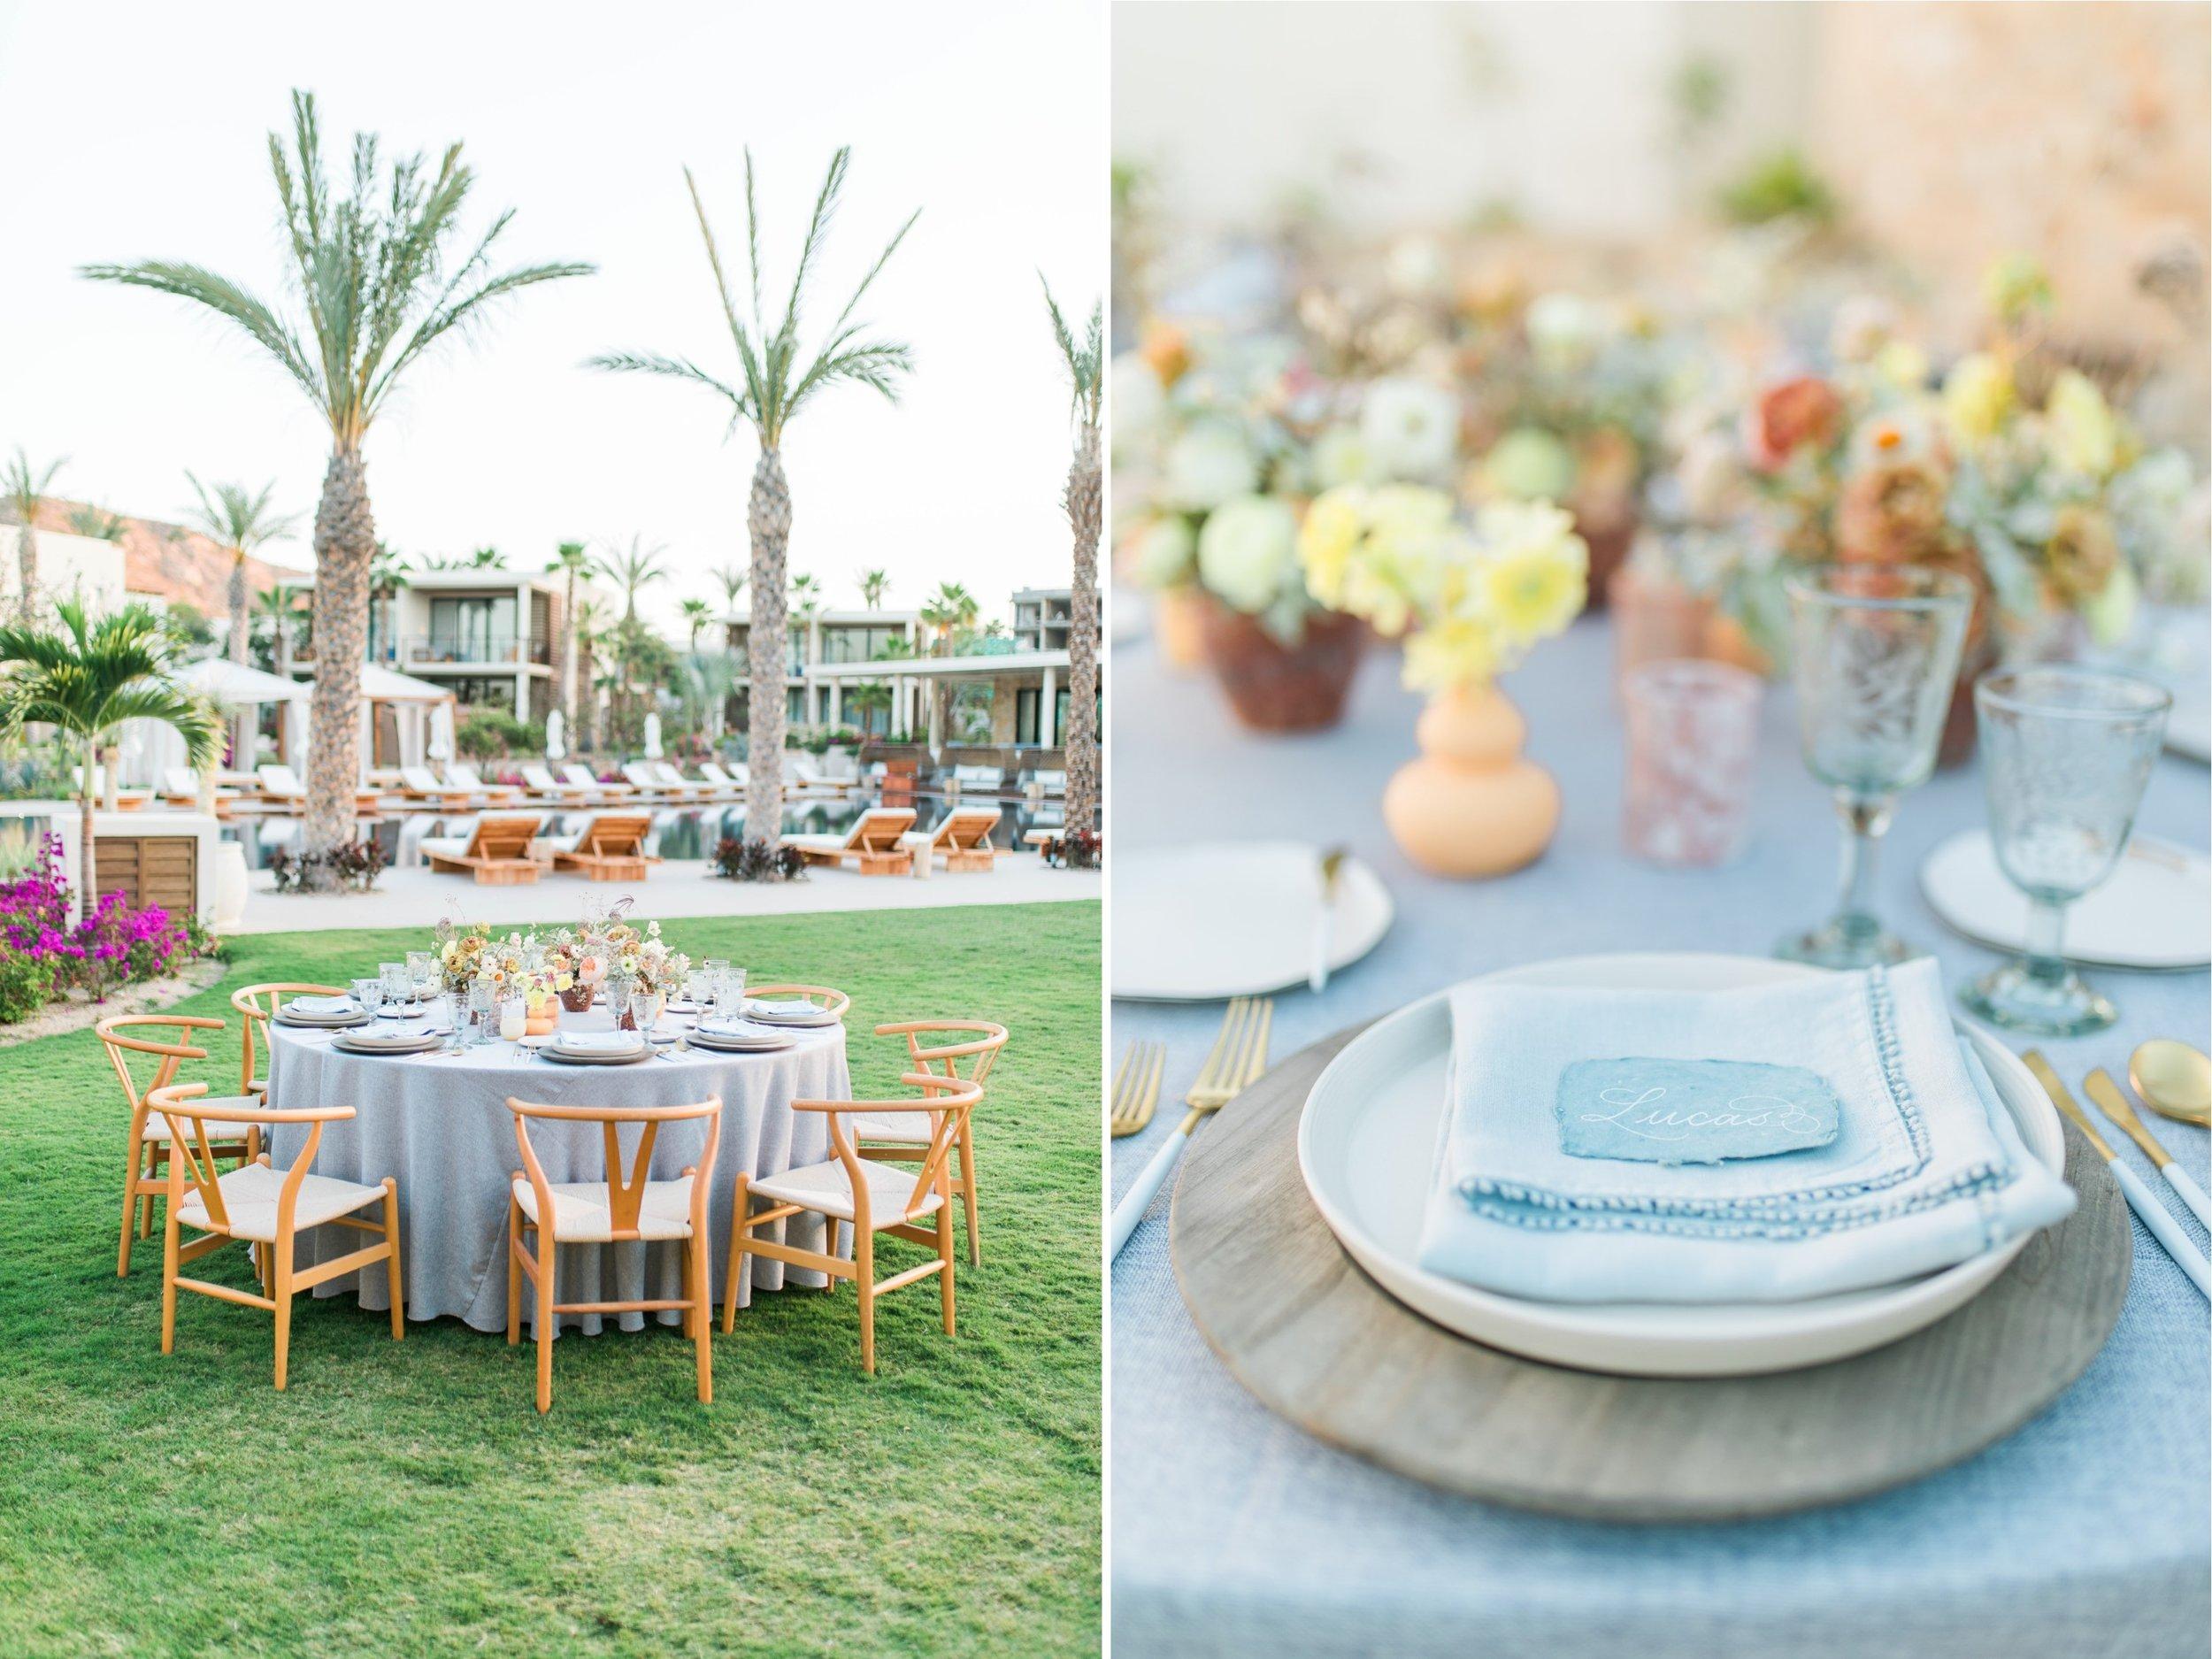 Los Cabos Wedding Photographer - Destination Wedding - Chileno Bay Resort Wedding Photos (22).jpg